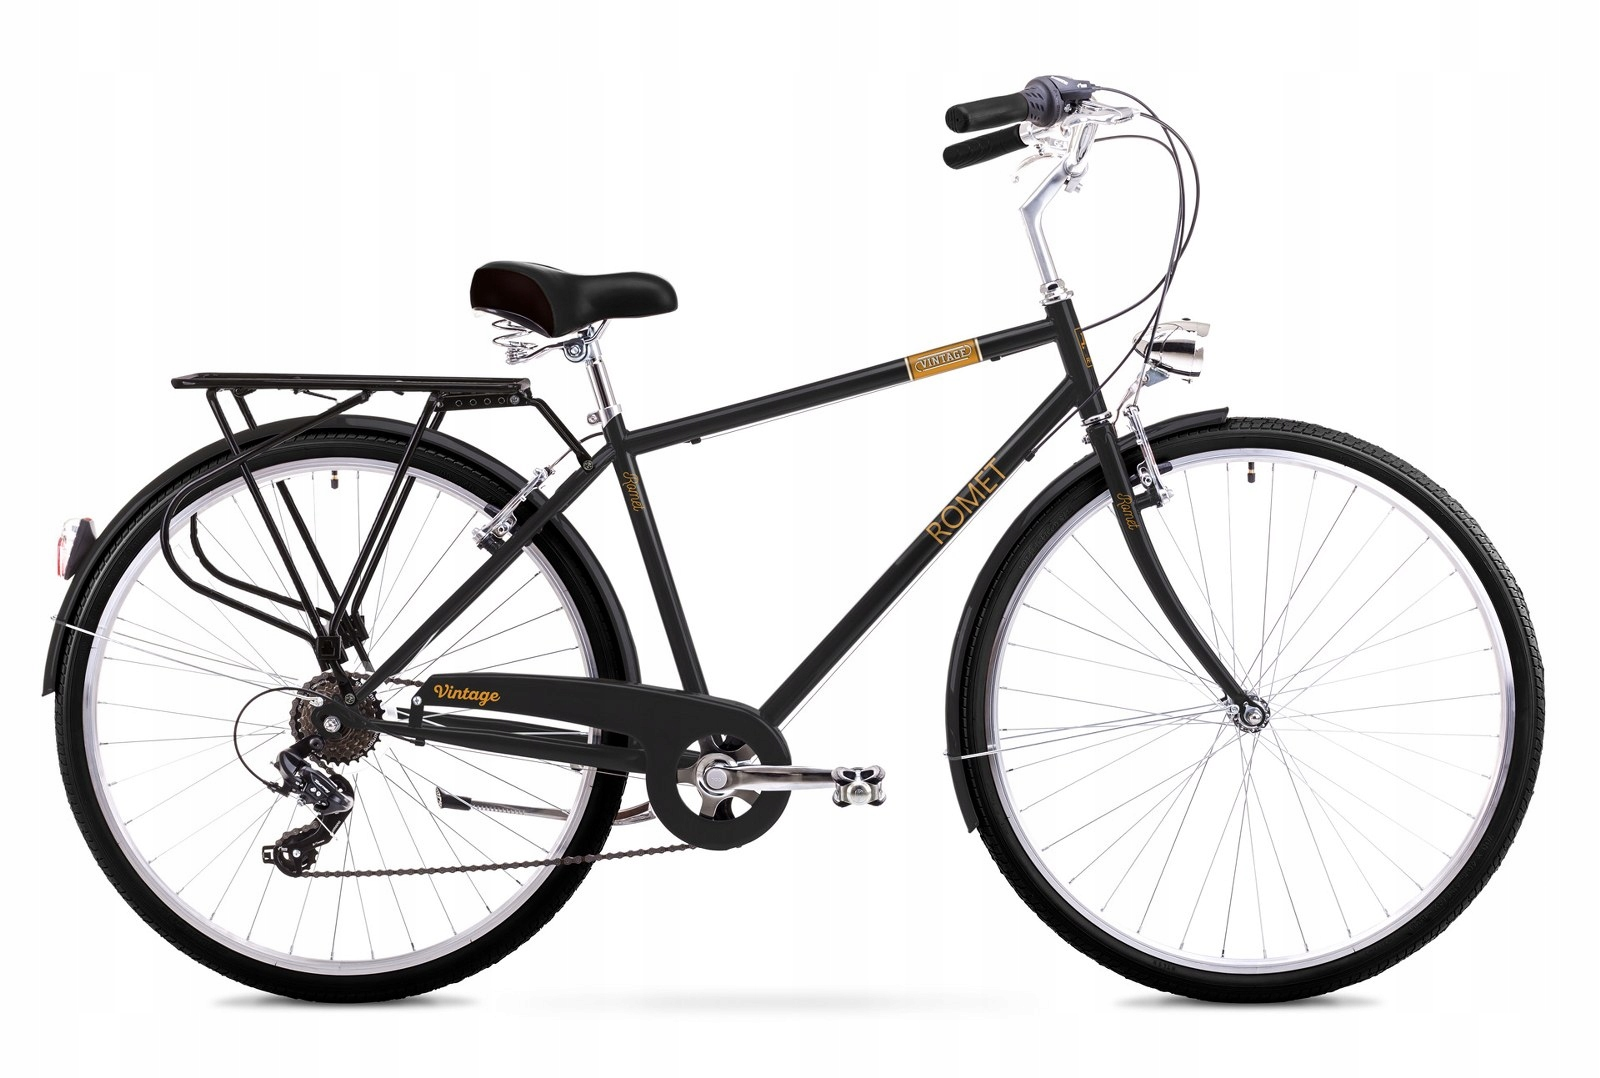 1928140 - 20 XL city Bike ROMET VINTAGE M